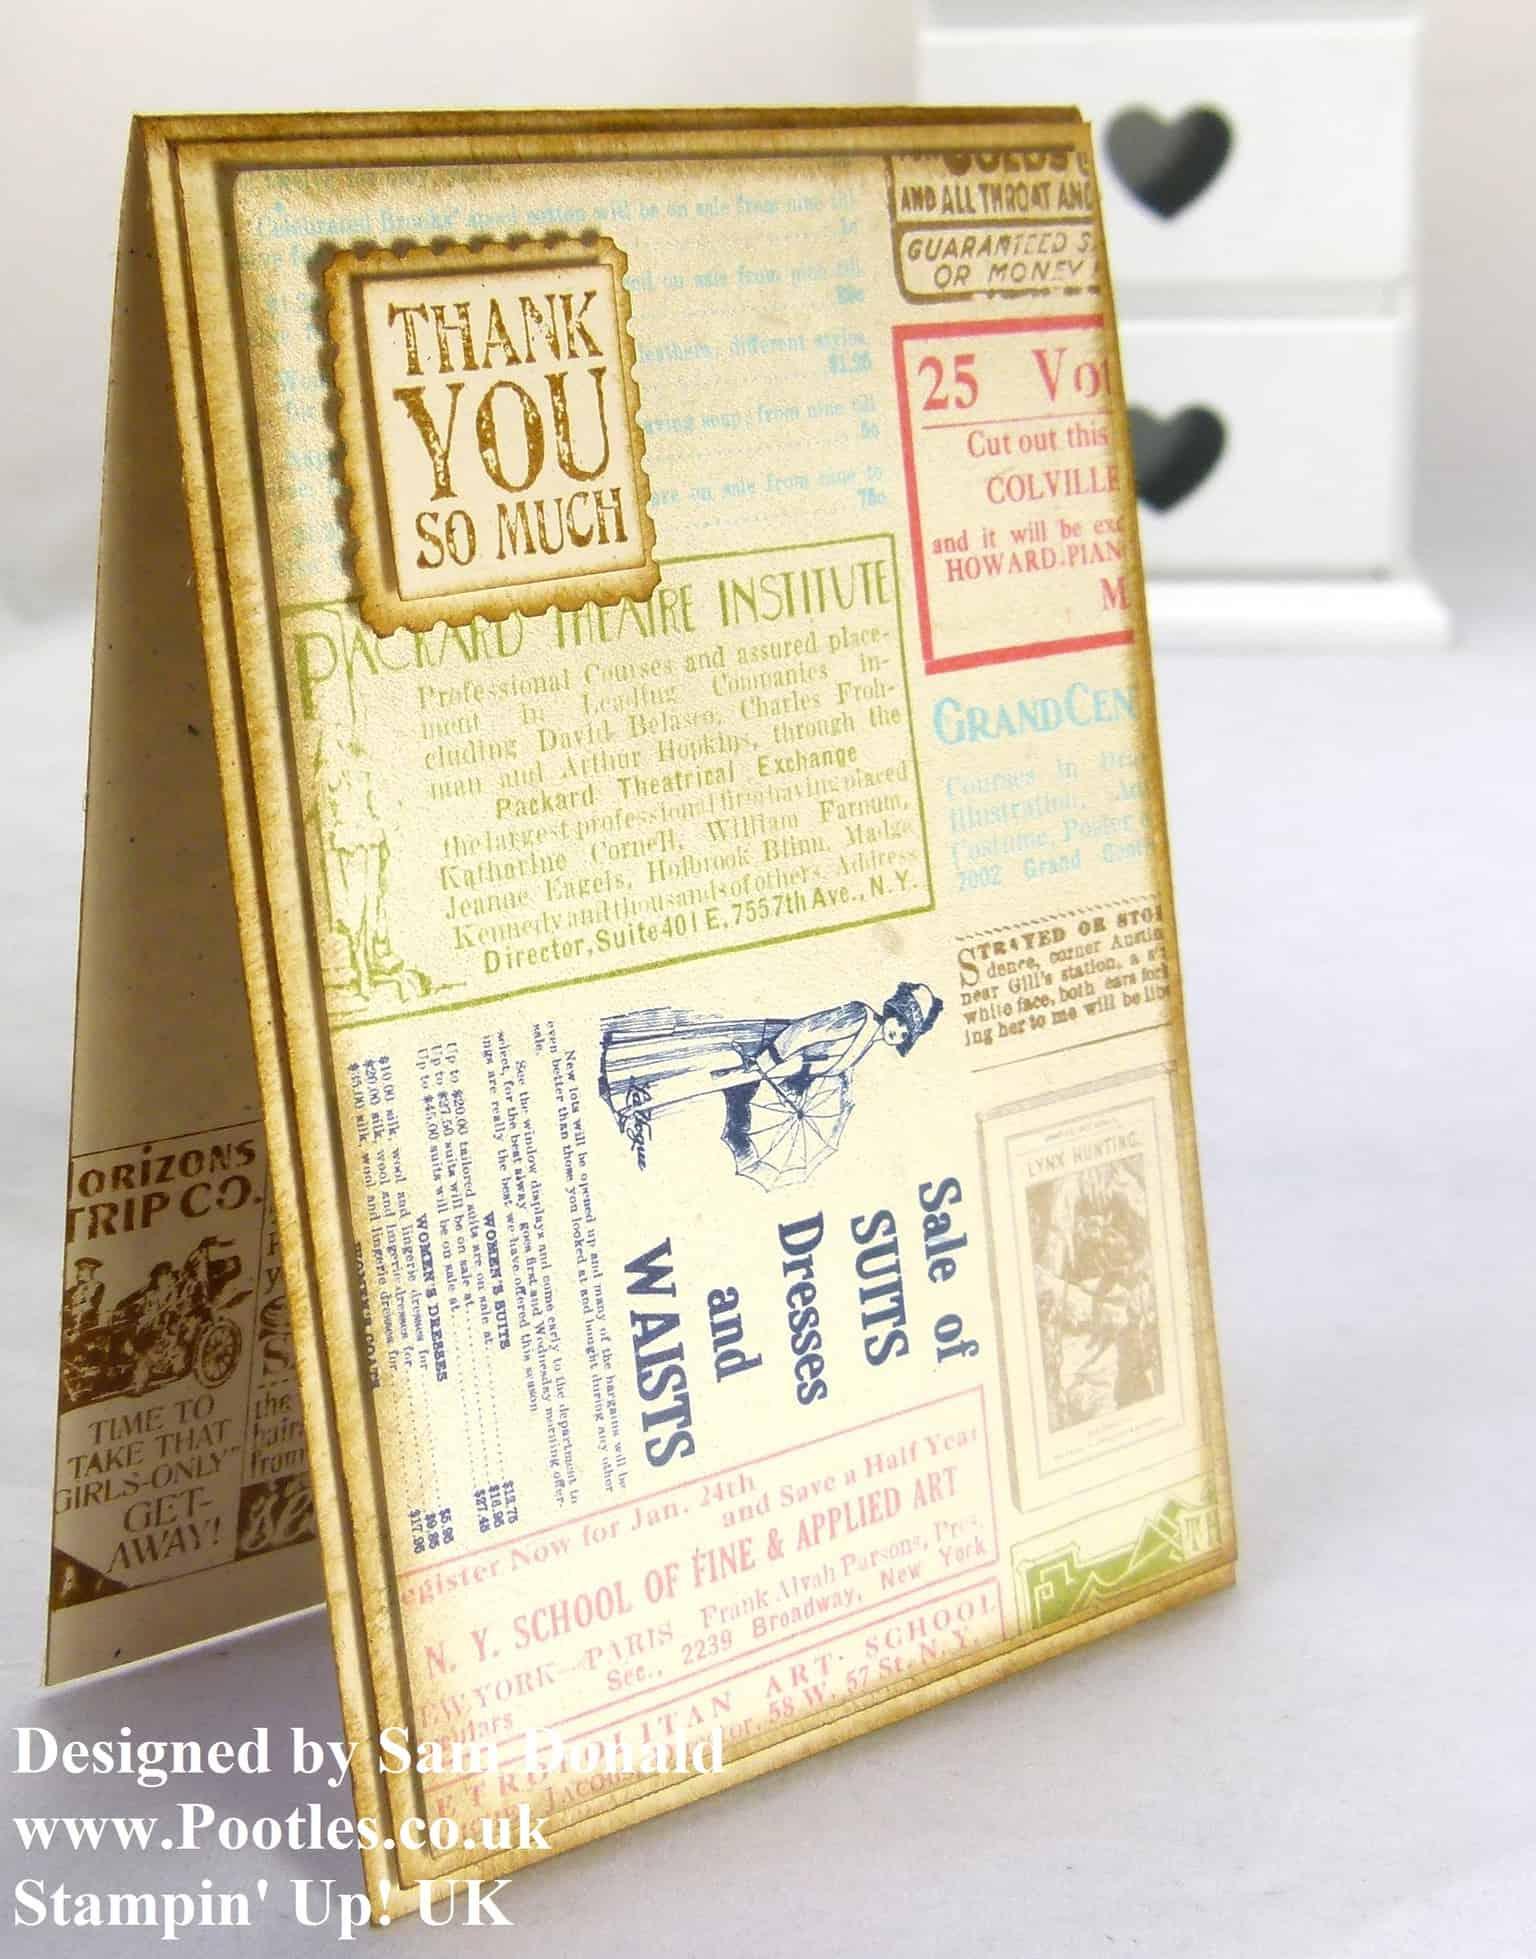 Pootles Stampin Up UK Vintage Style Etcetera Card